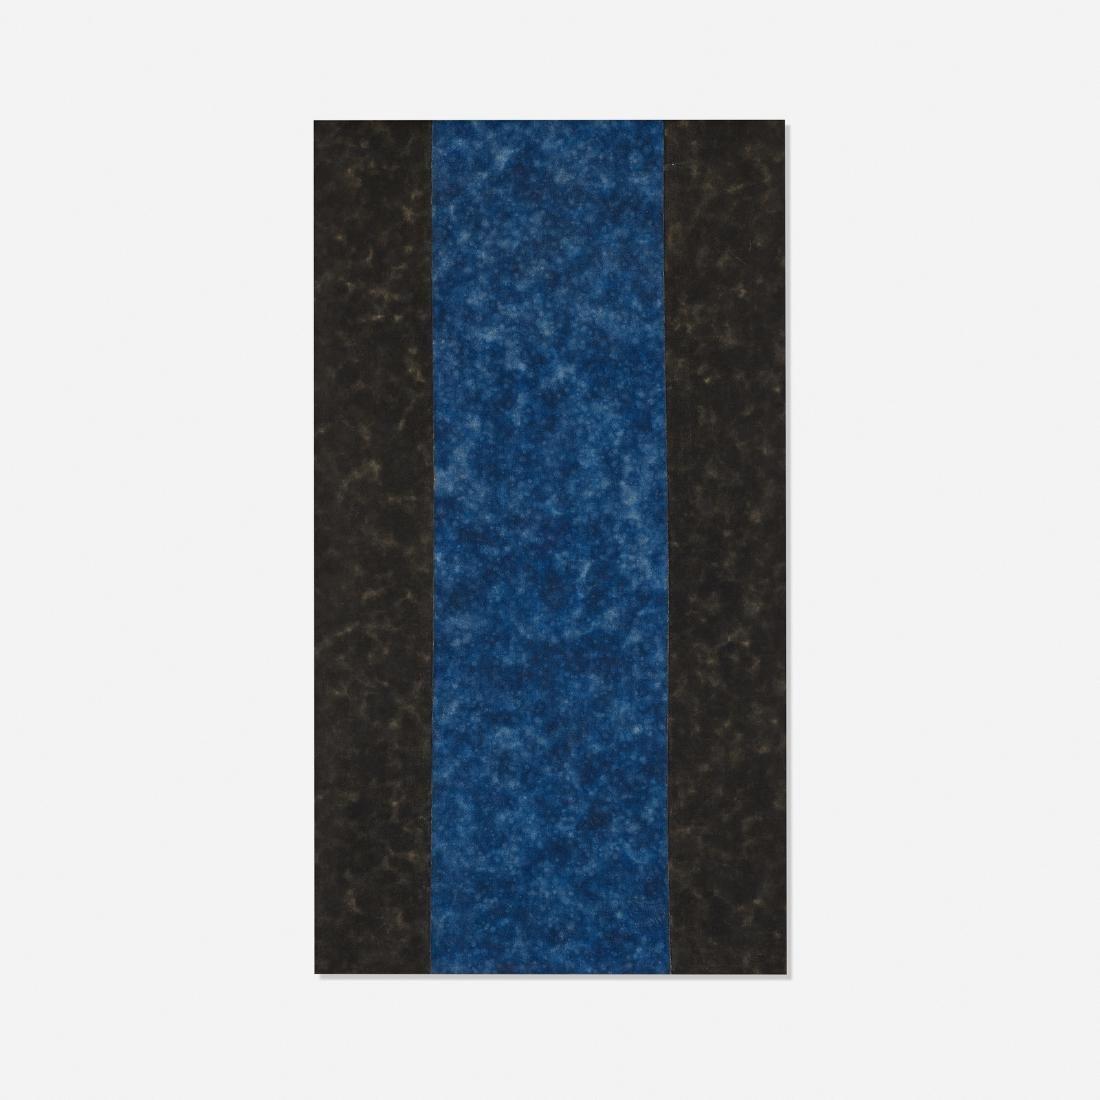 Howard Mehring, Black and Blue